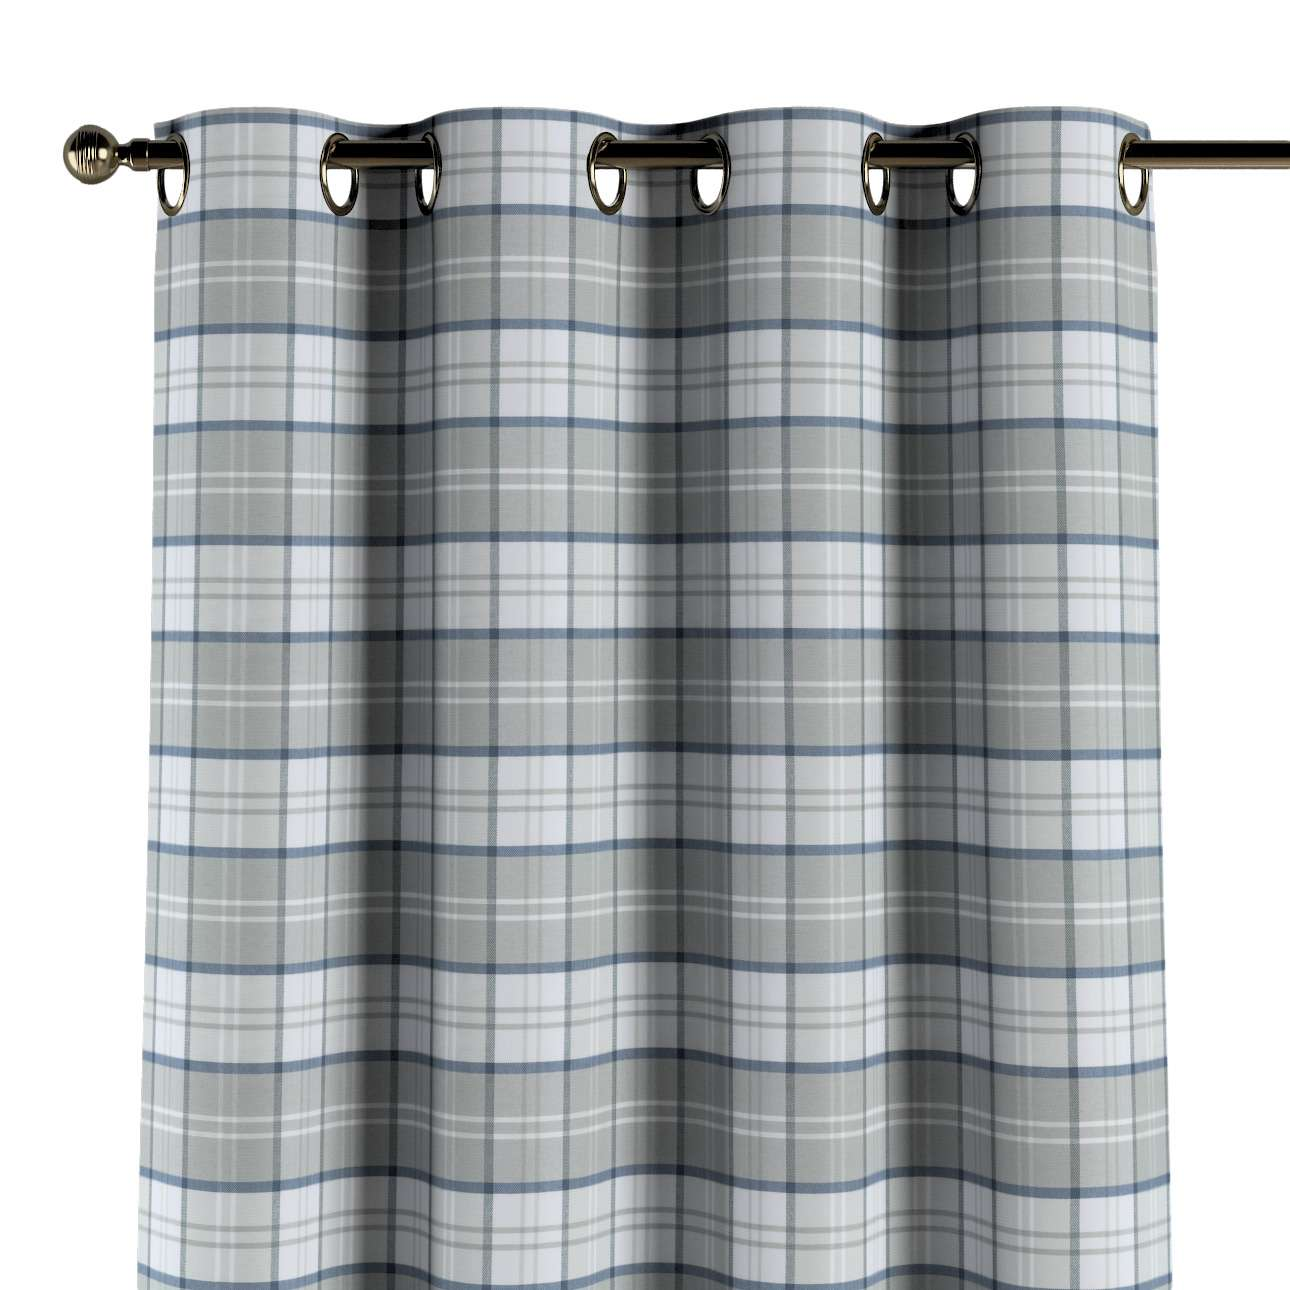 Záves s kolieskami V kolekcii Bristol, tkanina: 143-65